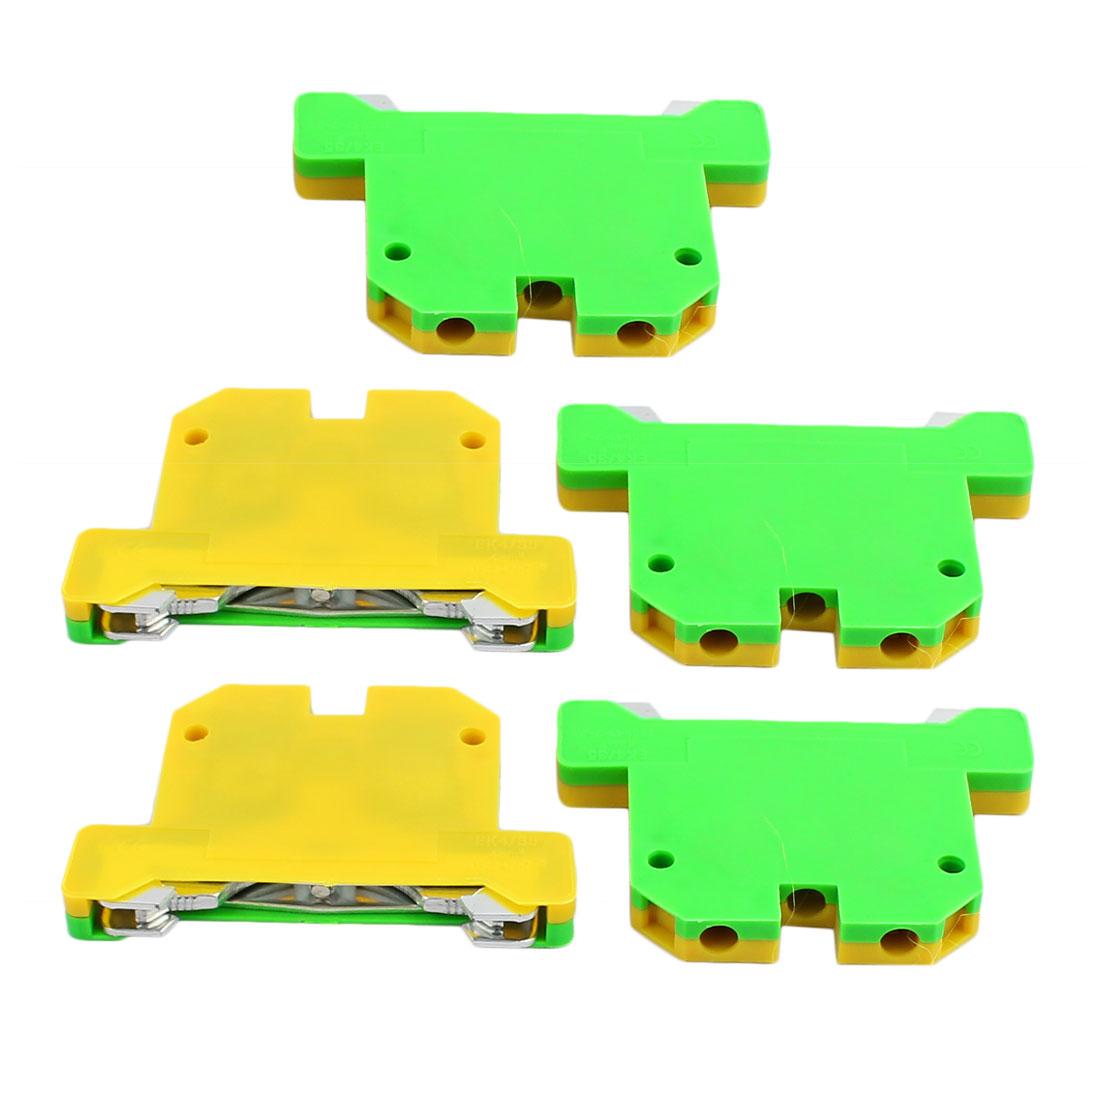 5Pcs 58x40x6.5mm 4mm2 Wire 800V Grounding Terminal Block Yellow Green